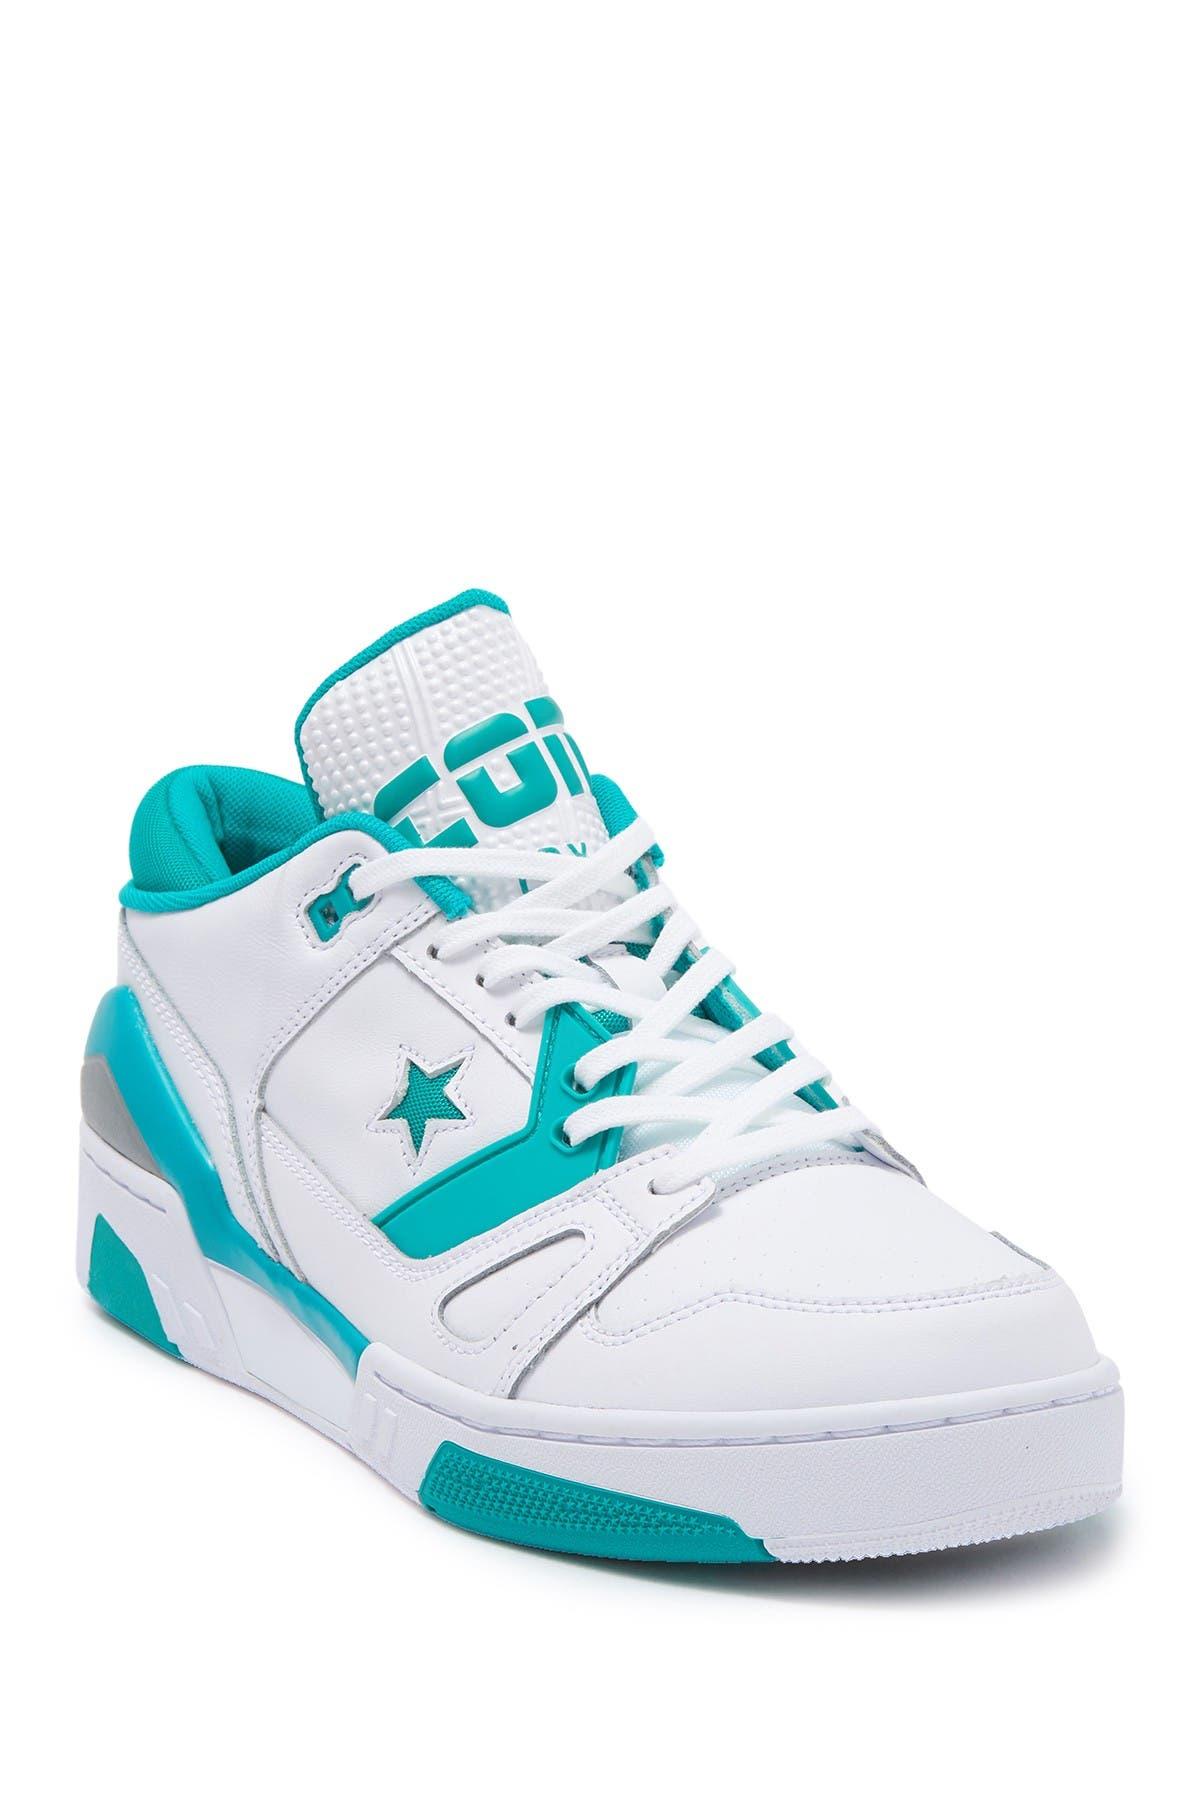 Image of Converse ERX 260 Mid Sneaker